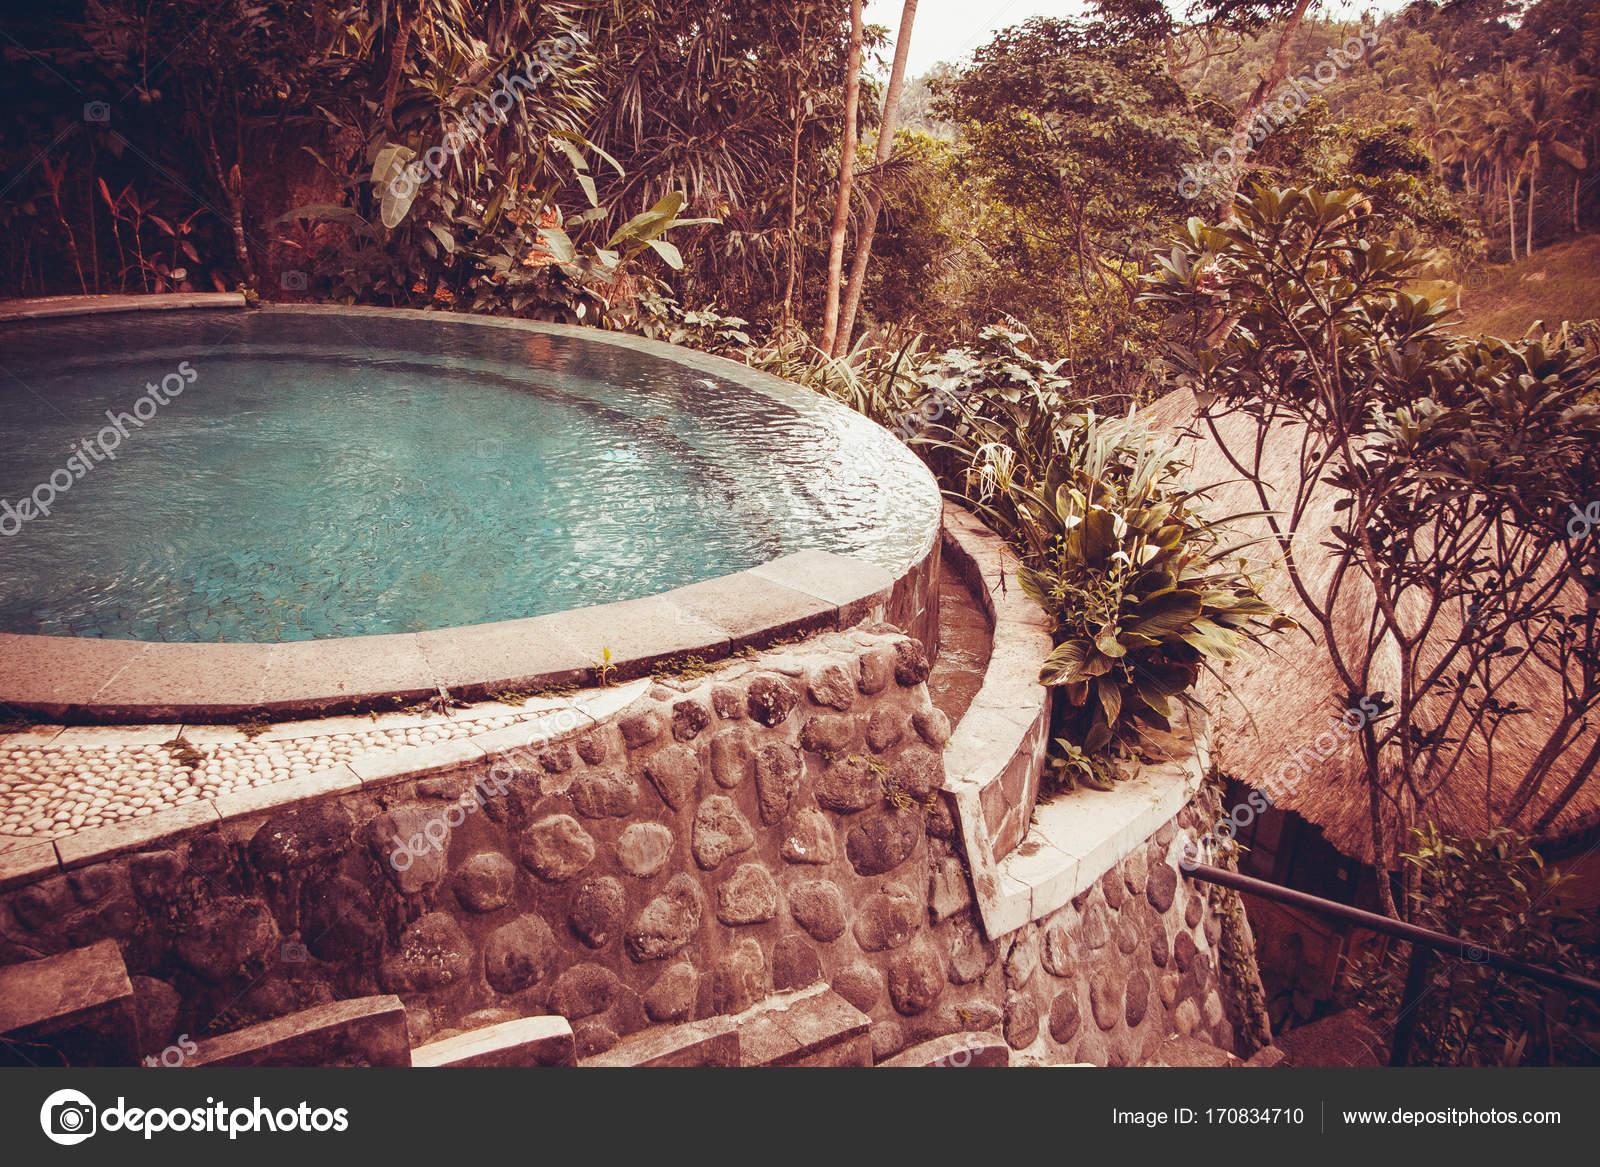 Schone Hotel Pool Bali Indonesien Stockfoto C Transurfer 170834710